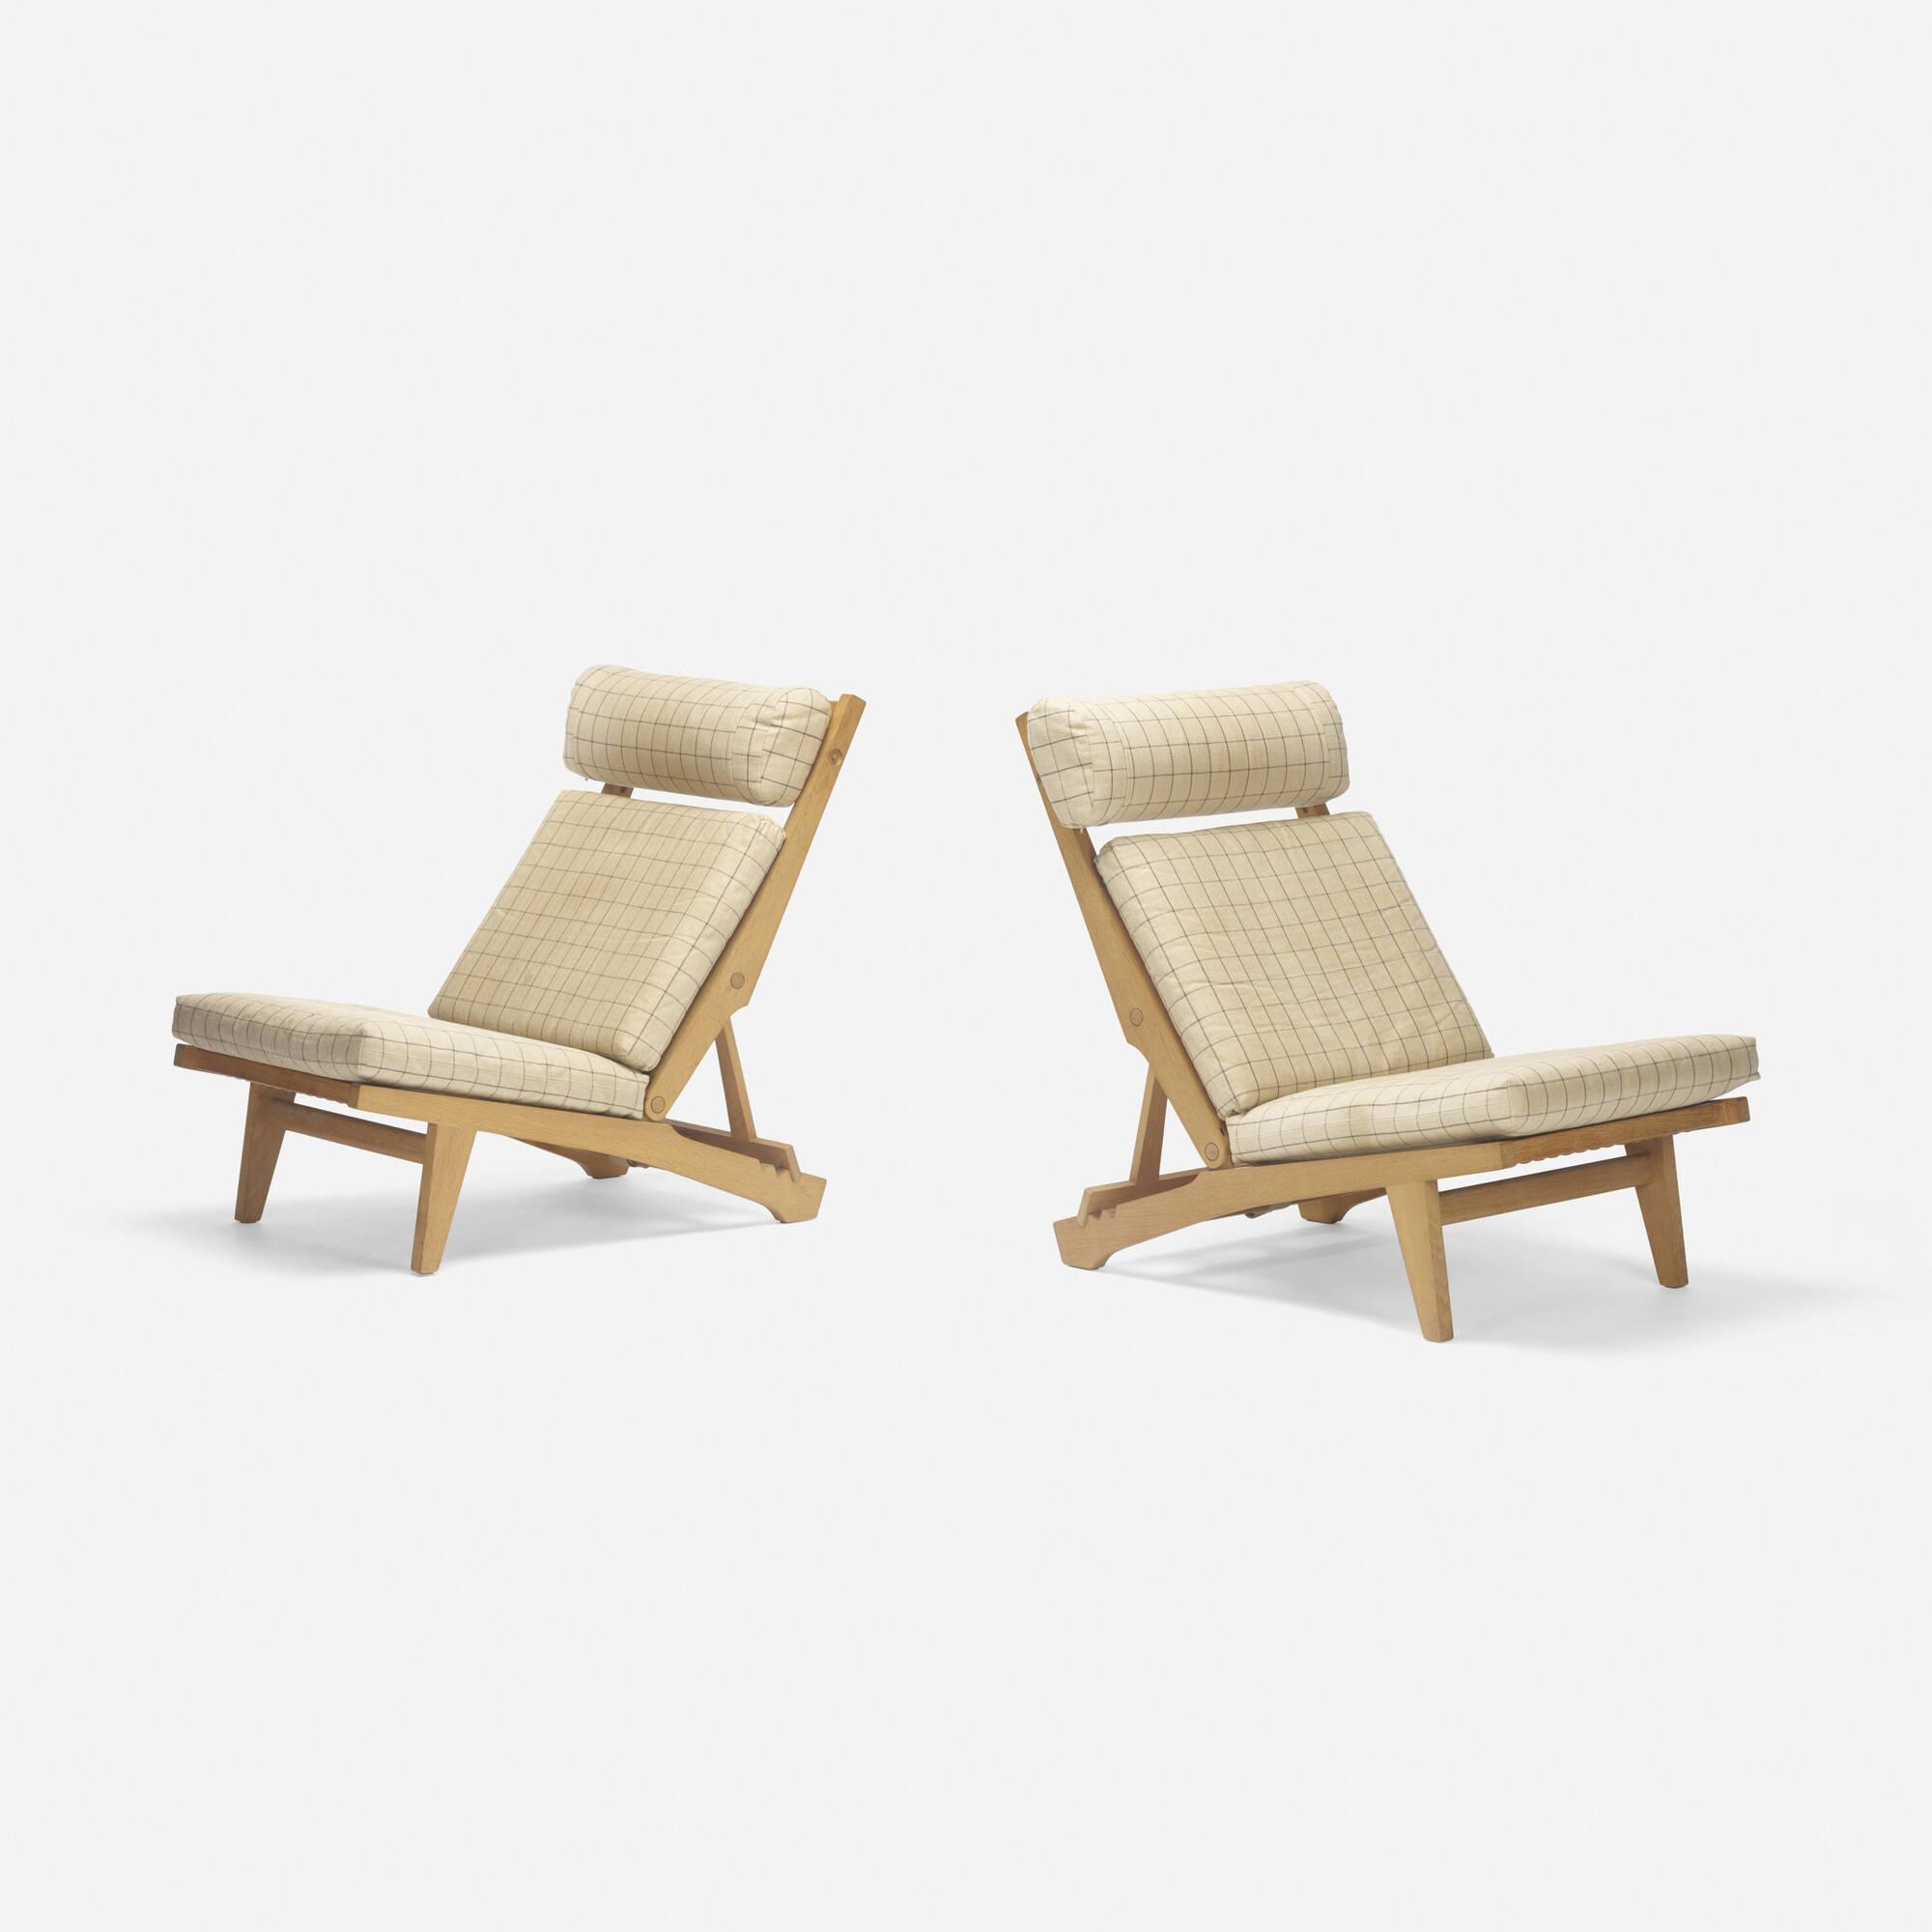 ... 235: Hans J. Wegner / Lounge Chairs Model AP 71, Pair (